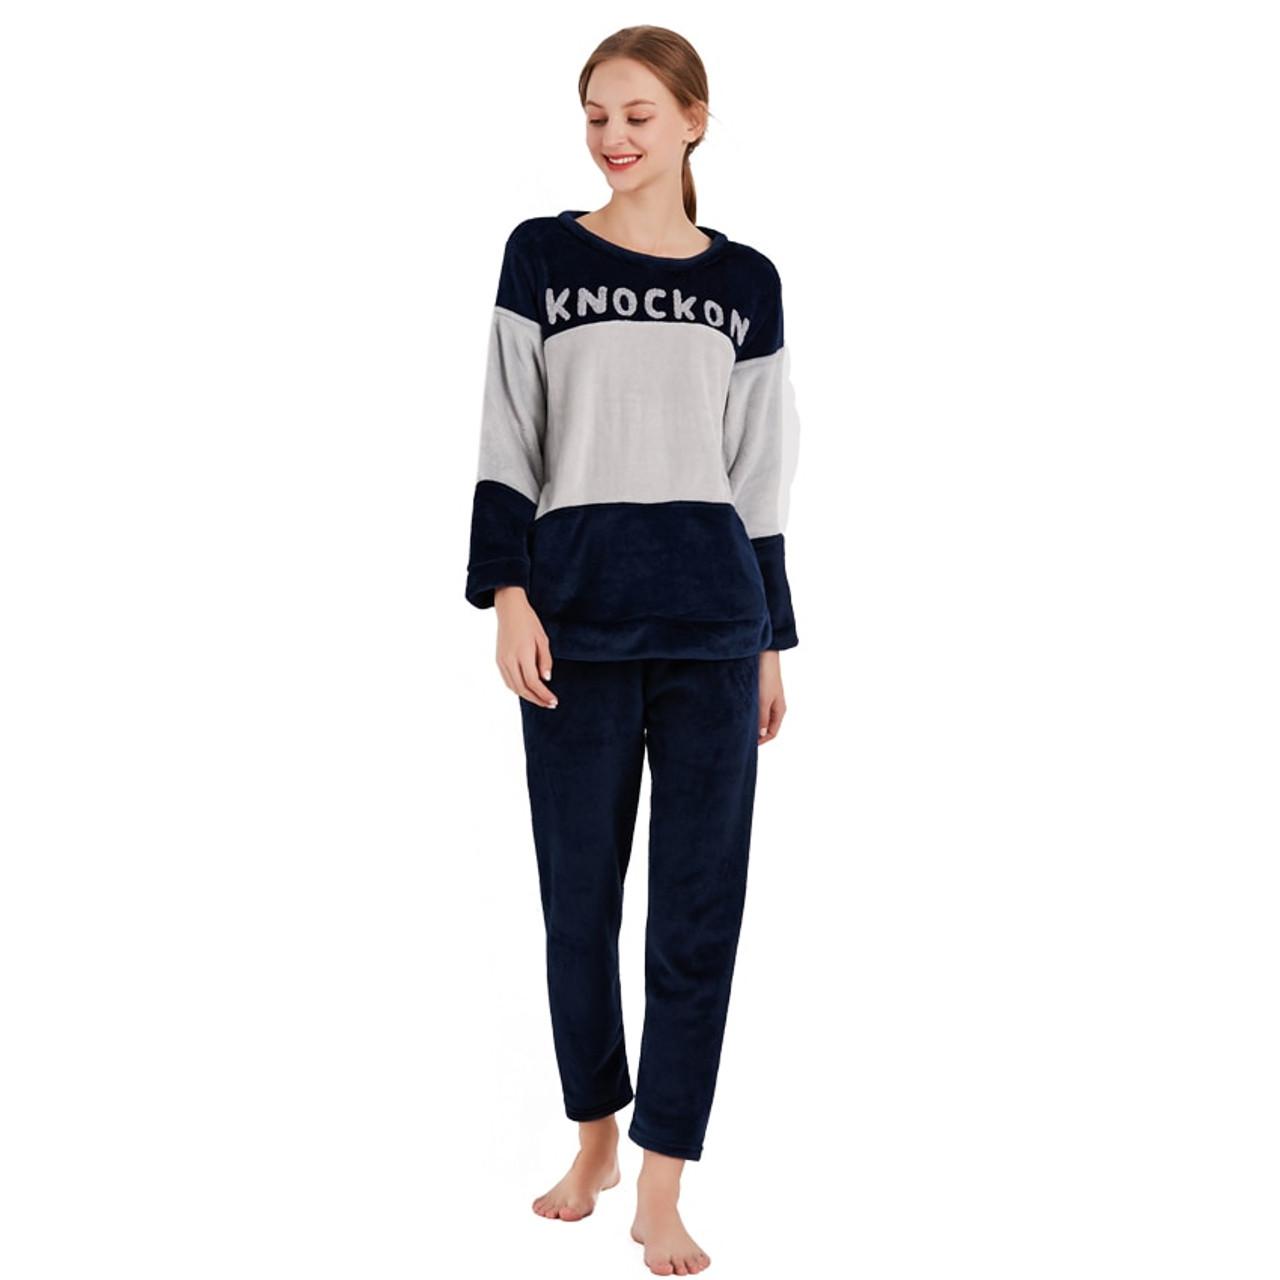 90719d2f9e ... Thick Warm Flannel Pajamas Sets Winter Women Two Piece Pajama Set  Cartoon Female Sleepwear Home Clothing ...